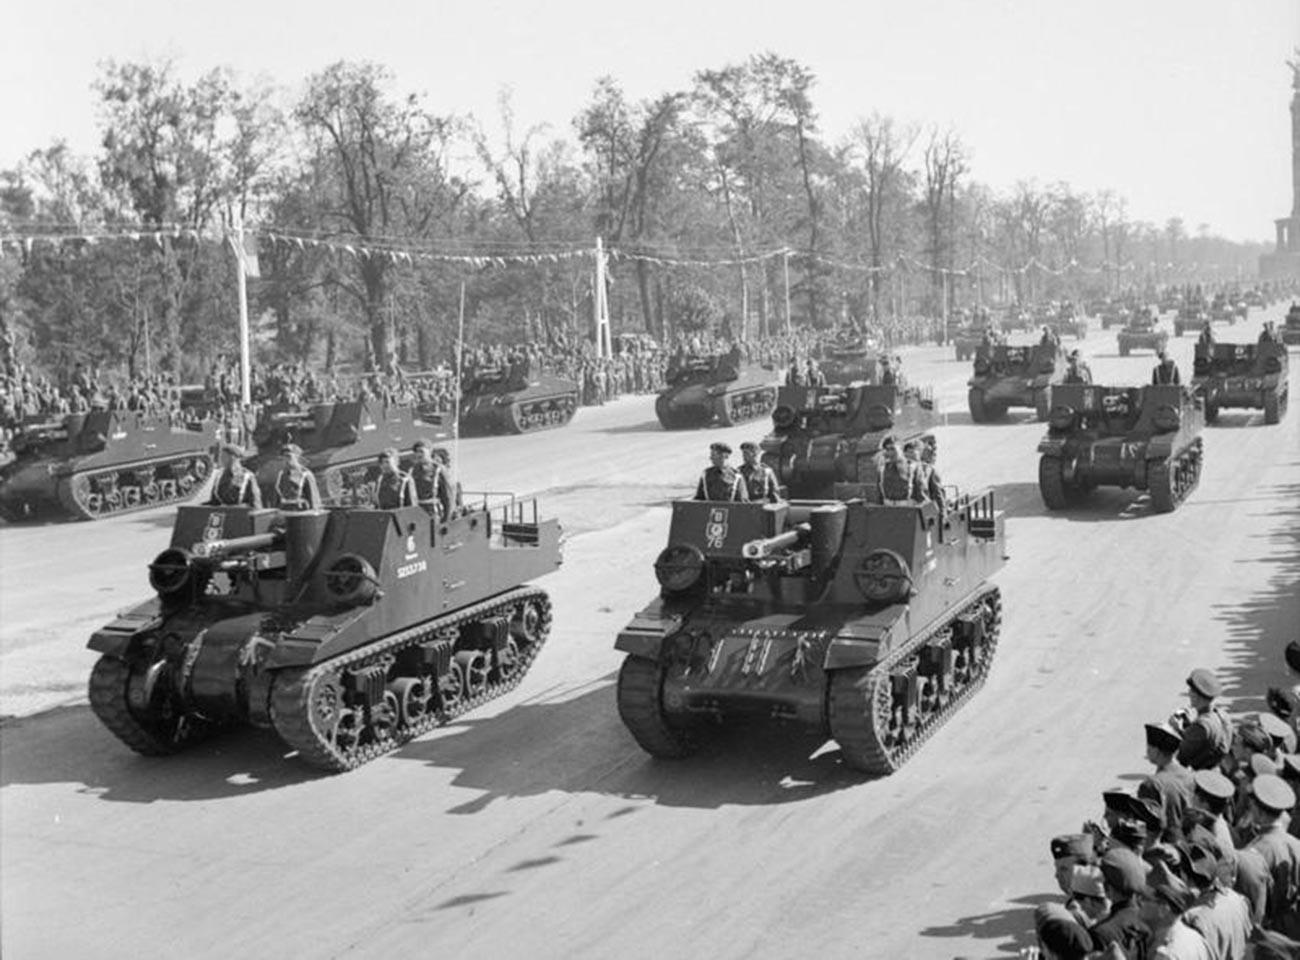 British Sexton self-propelled guns during the parade on September 7.